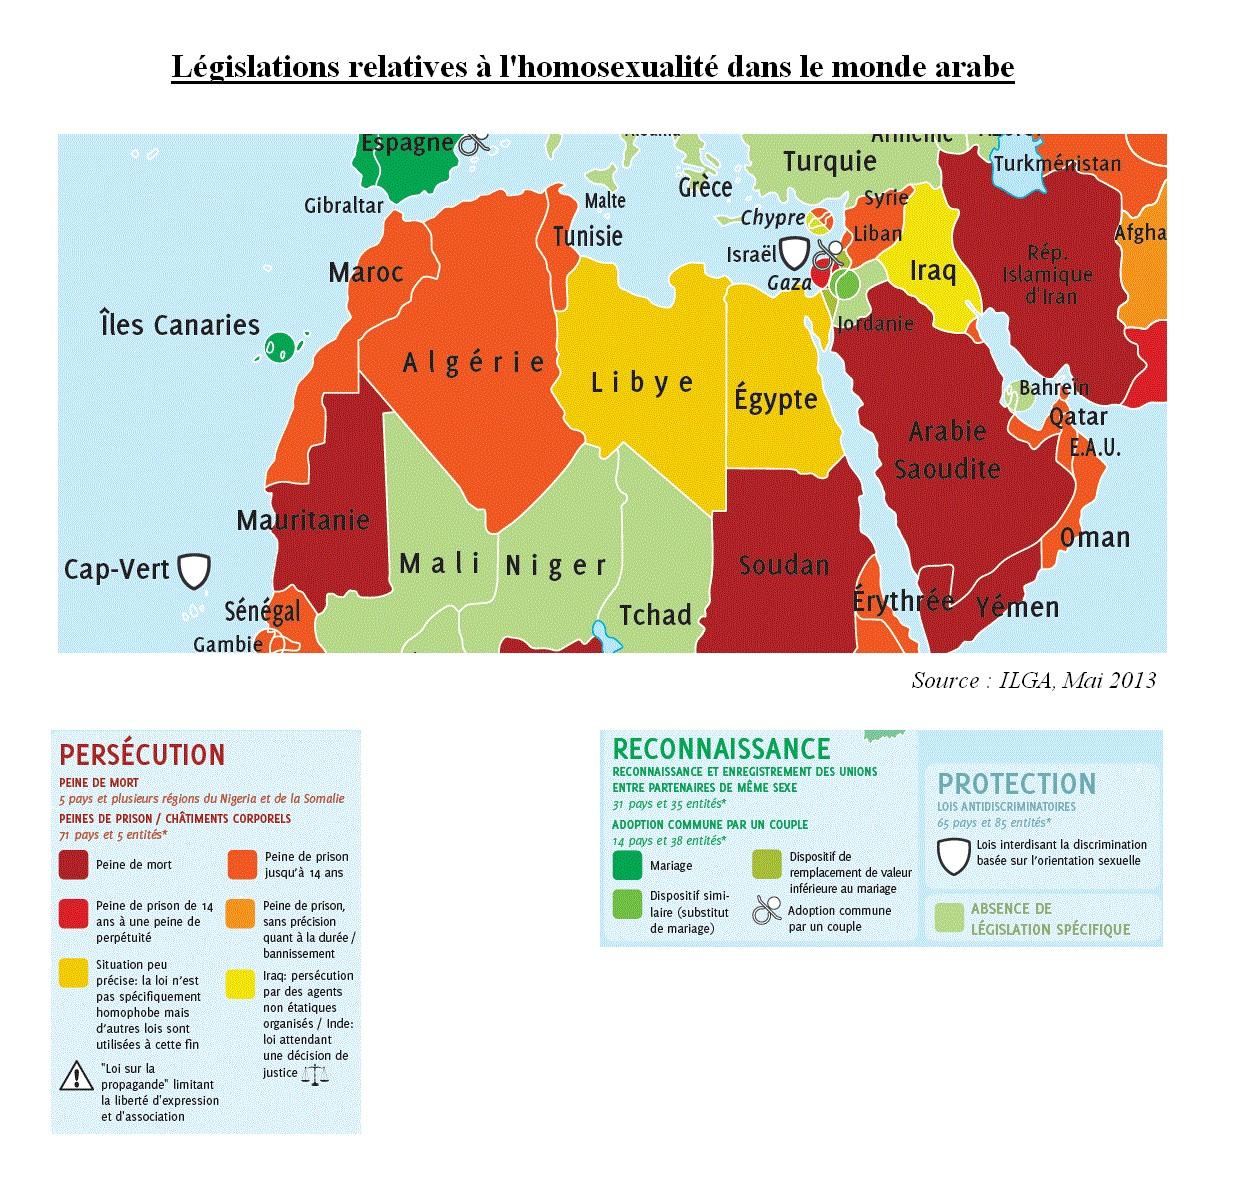 lois-homosexualite-monde-arabe_1425308340031-jpg